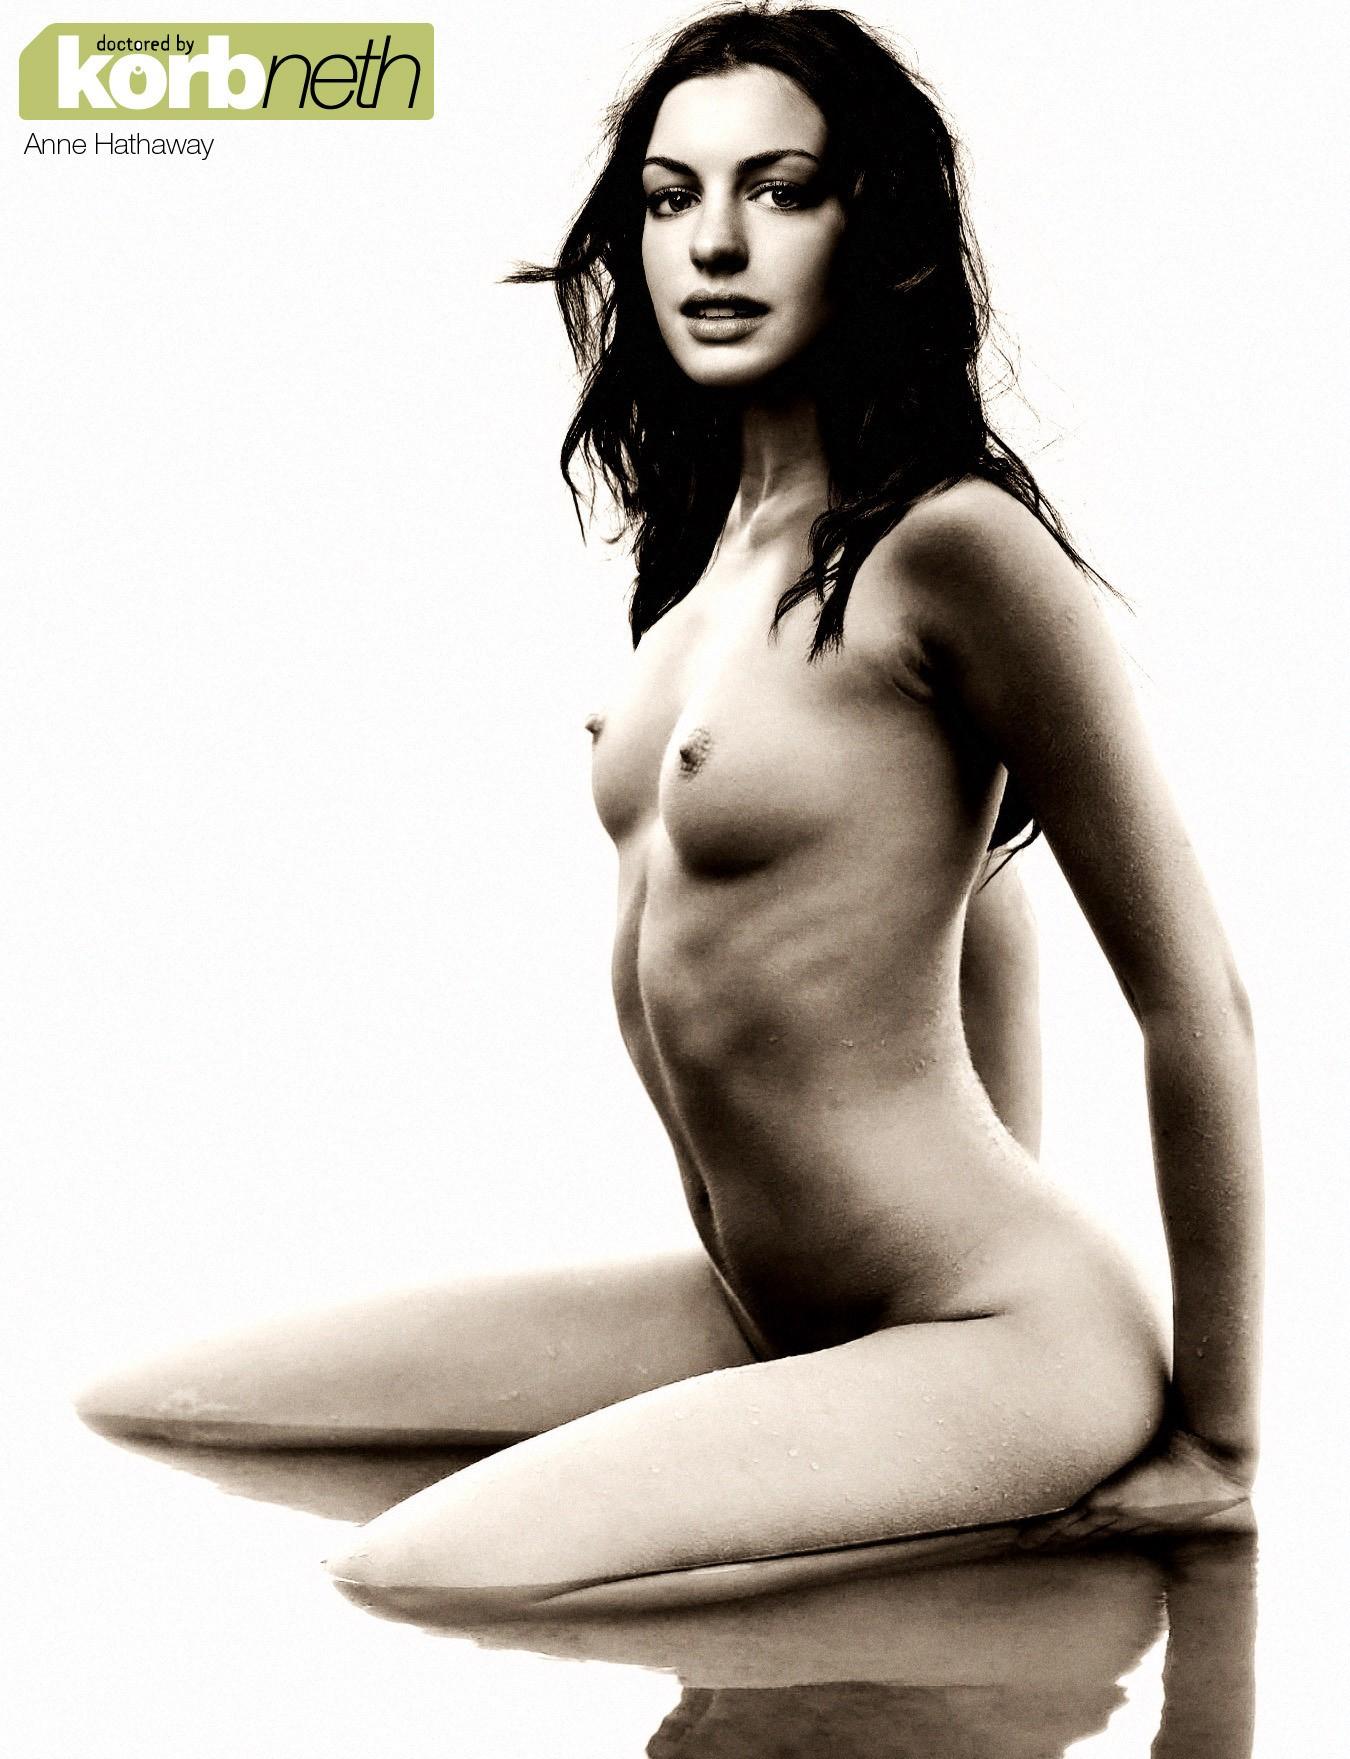 anne-hathaway-nude-tgp-wife-sucking-penis